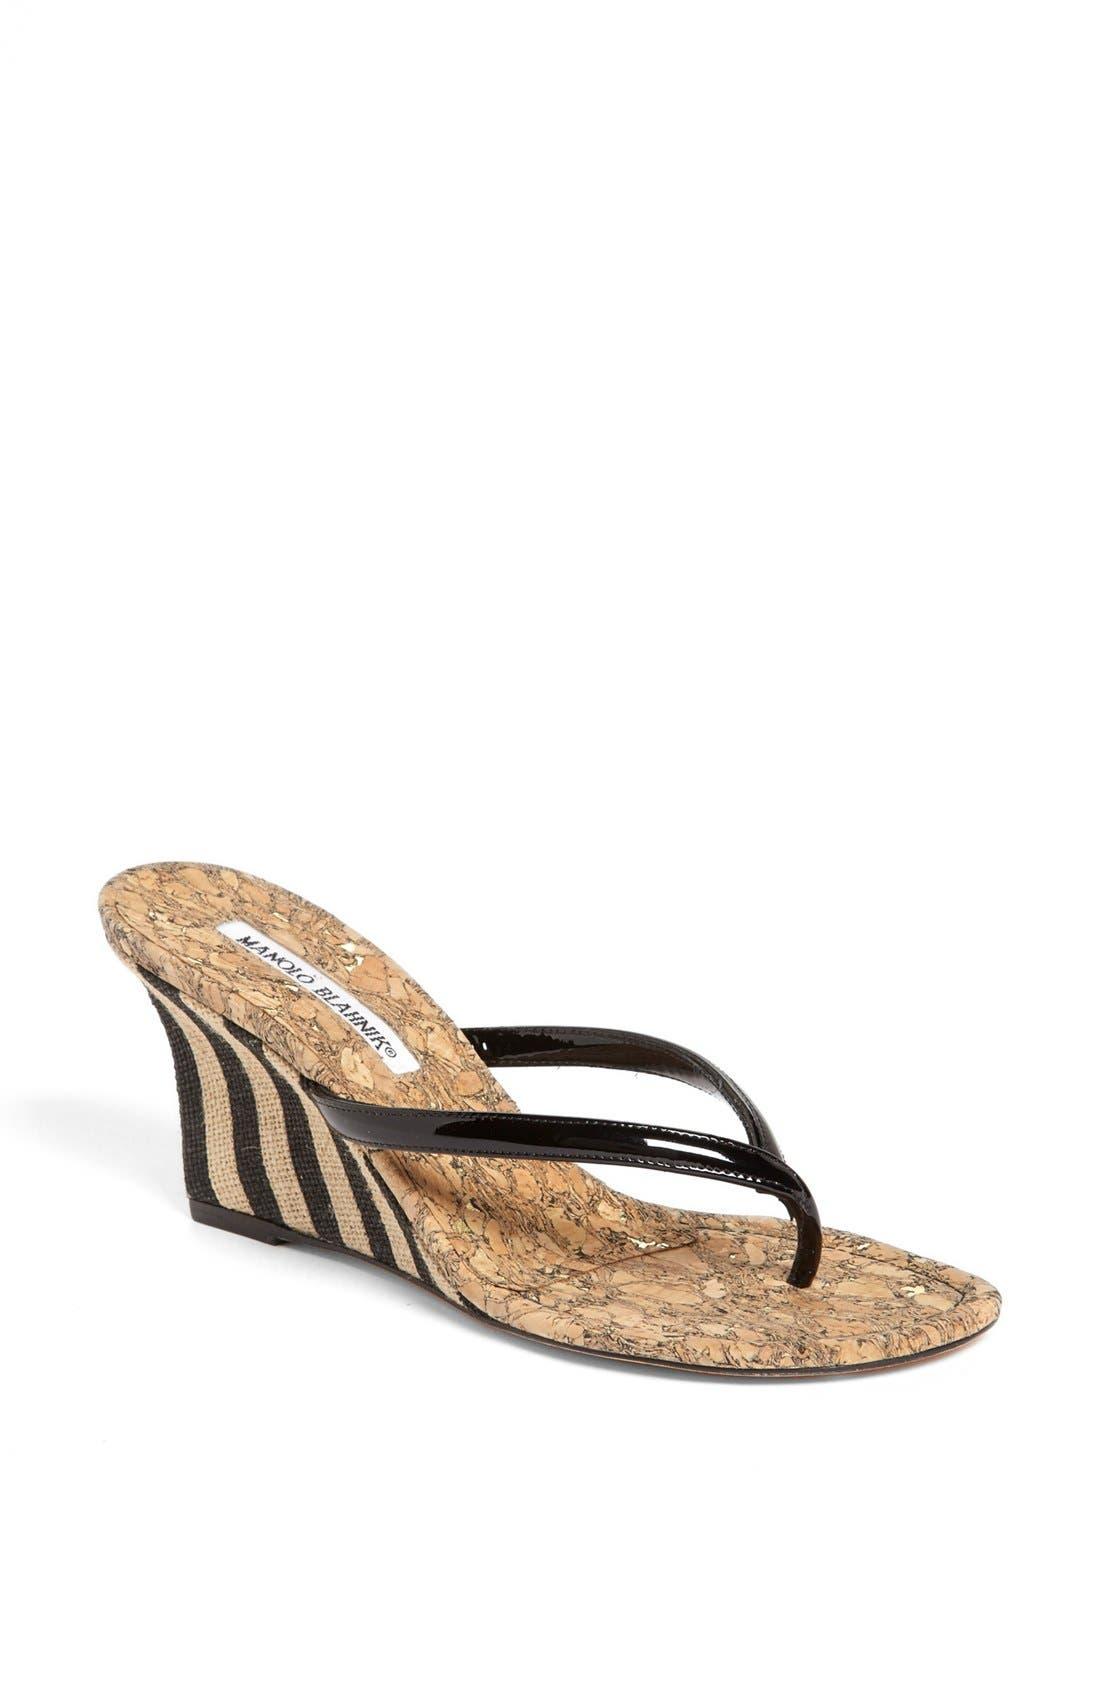 Alternate Image 1 Selected - Manolo Blahnik 'Pat' Wedge Sandal